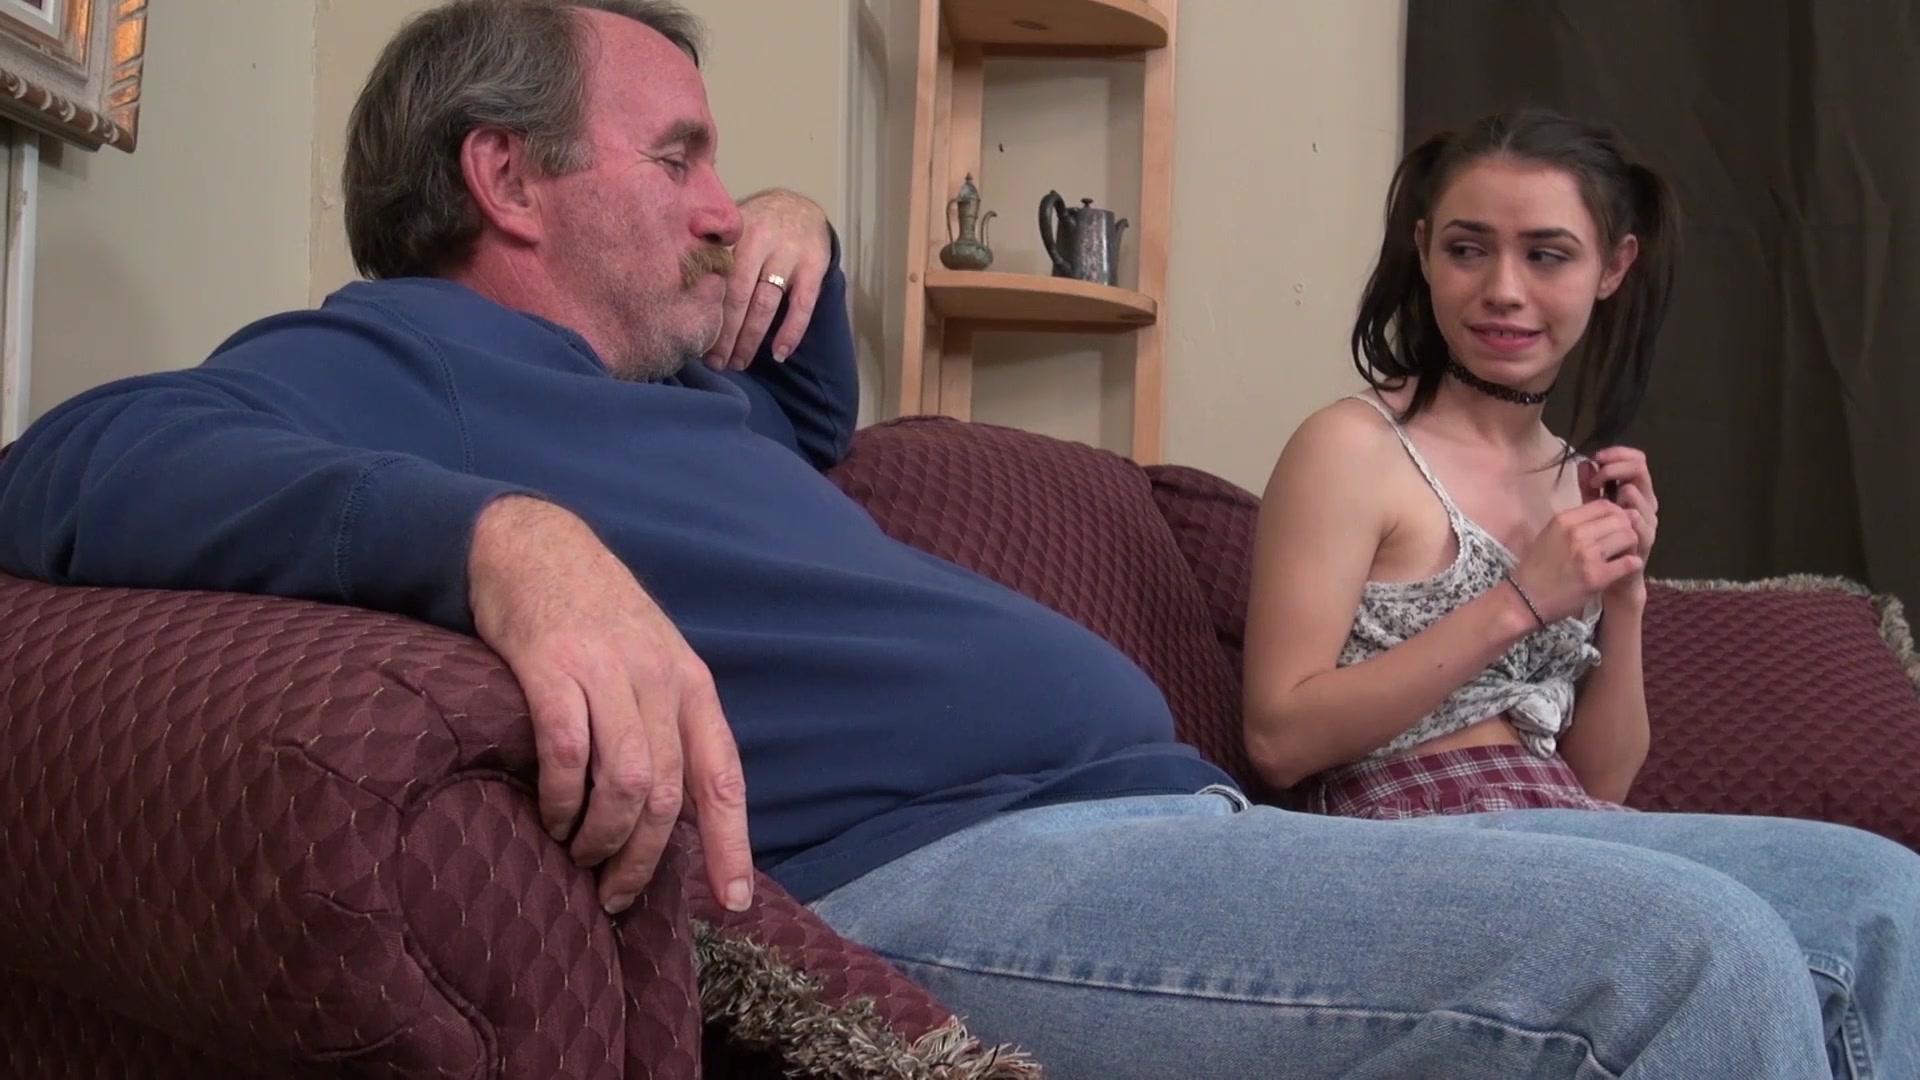 Son, Your Mom Needs Lovin Too Erotic Stories